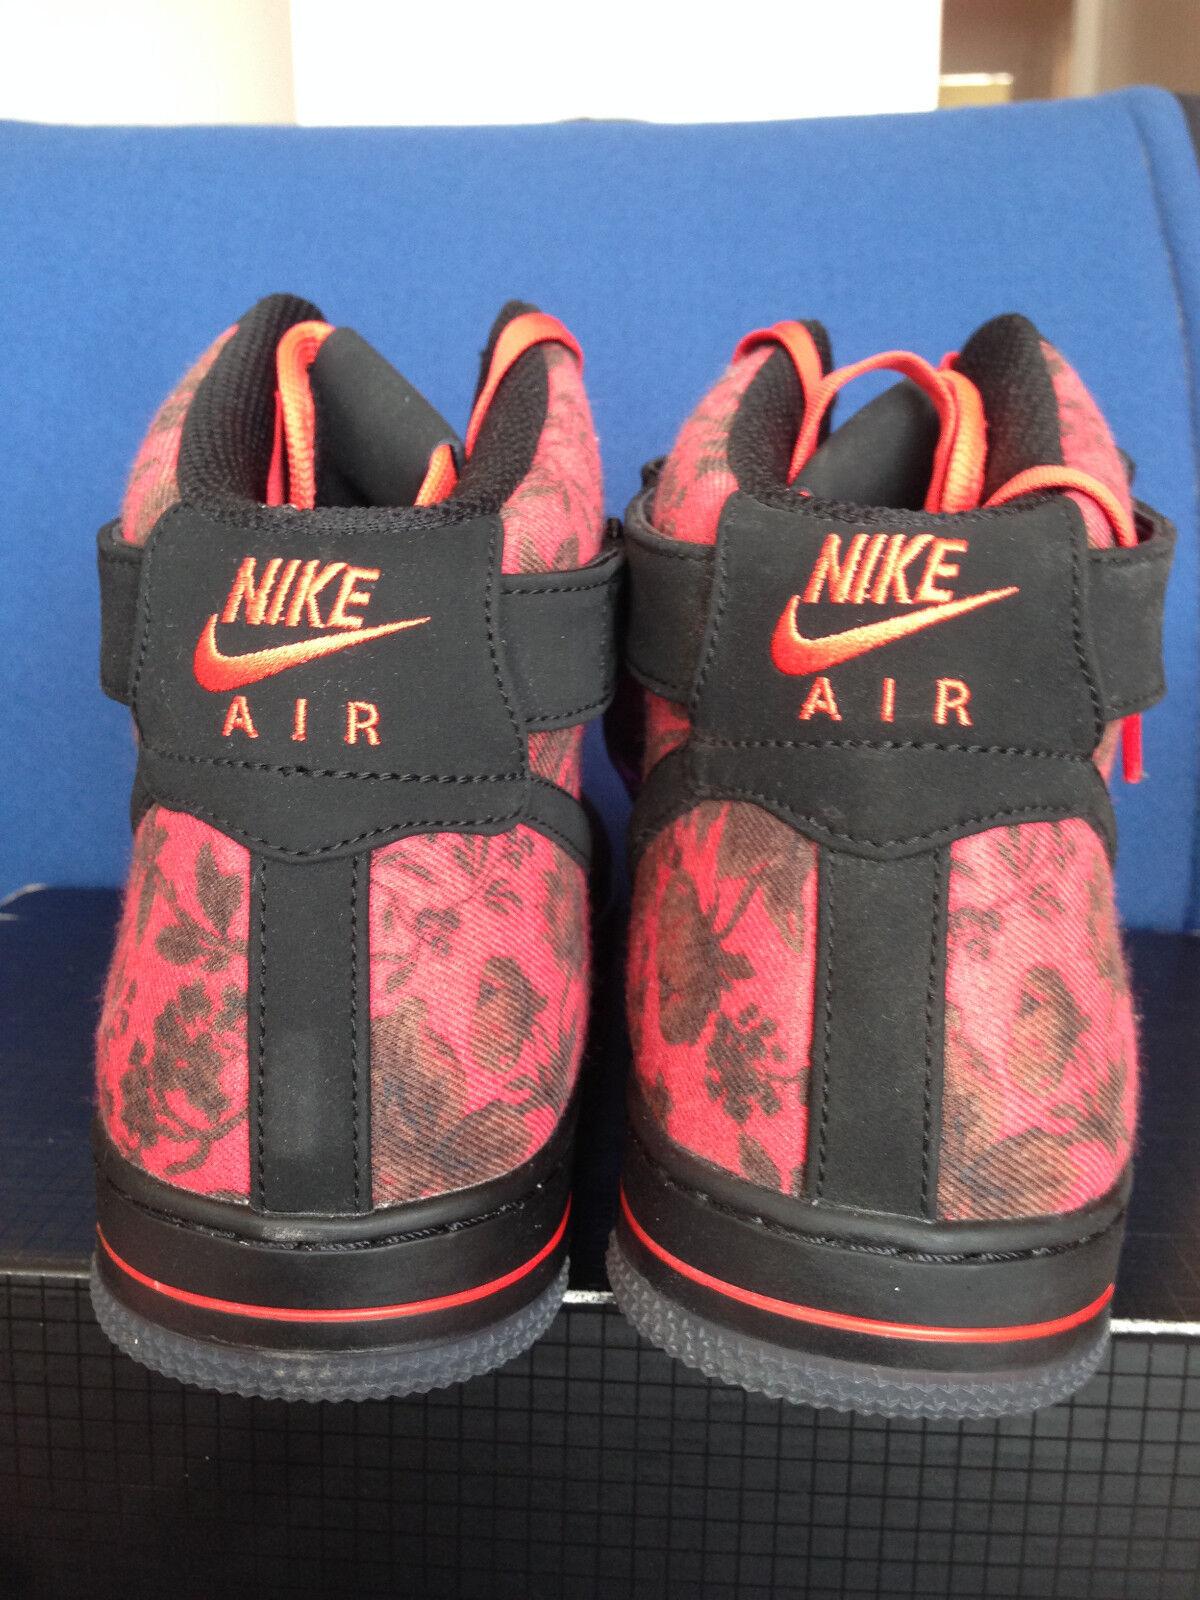 nike air force hohe 1 qs downtown - hohe force floral kd rosengarten schwarz - rot - lillard 14. 742a39